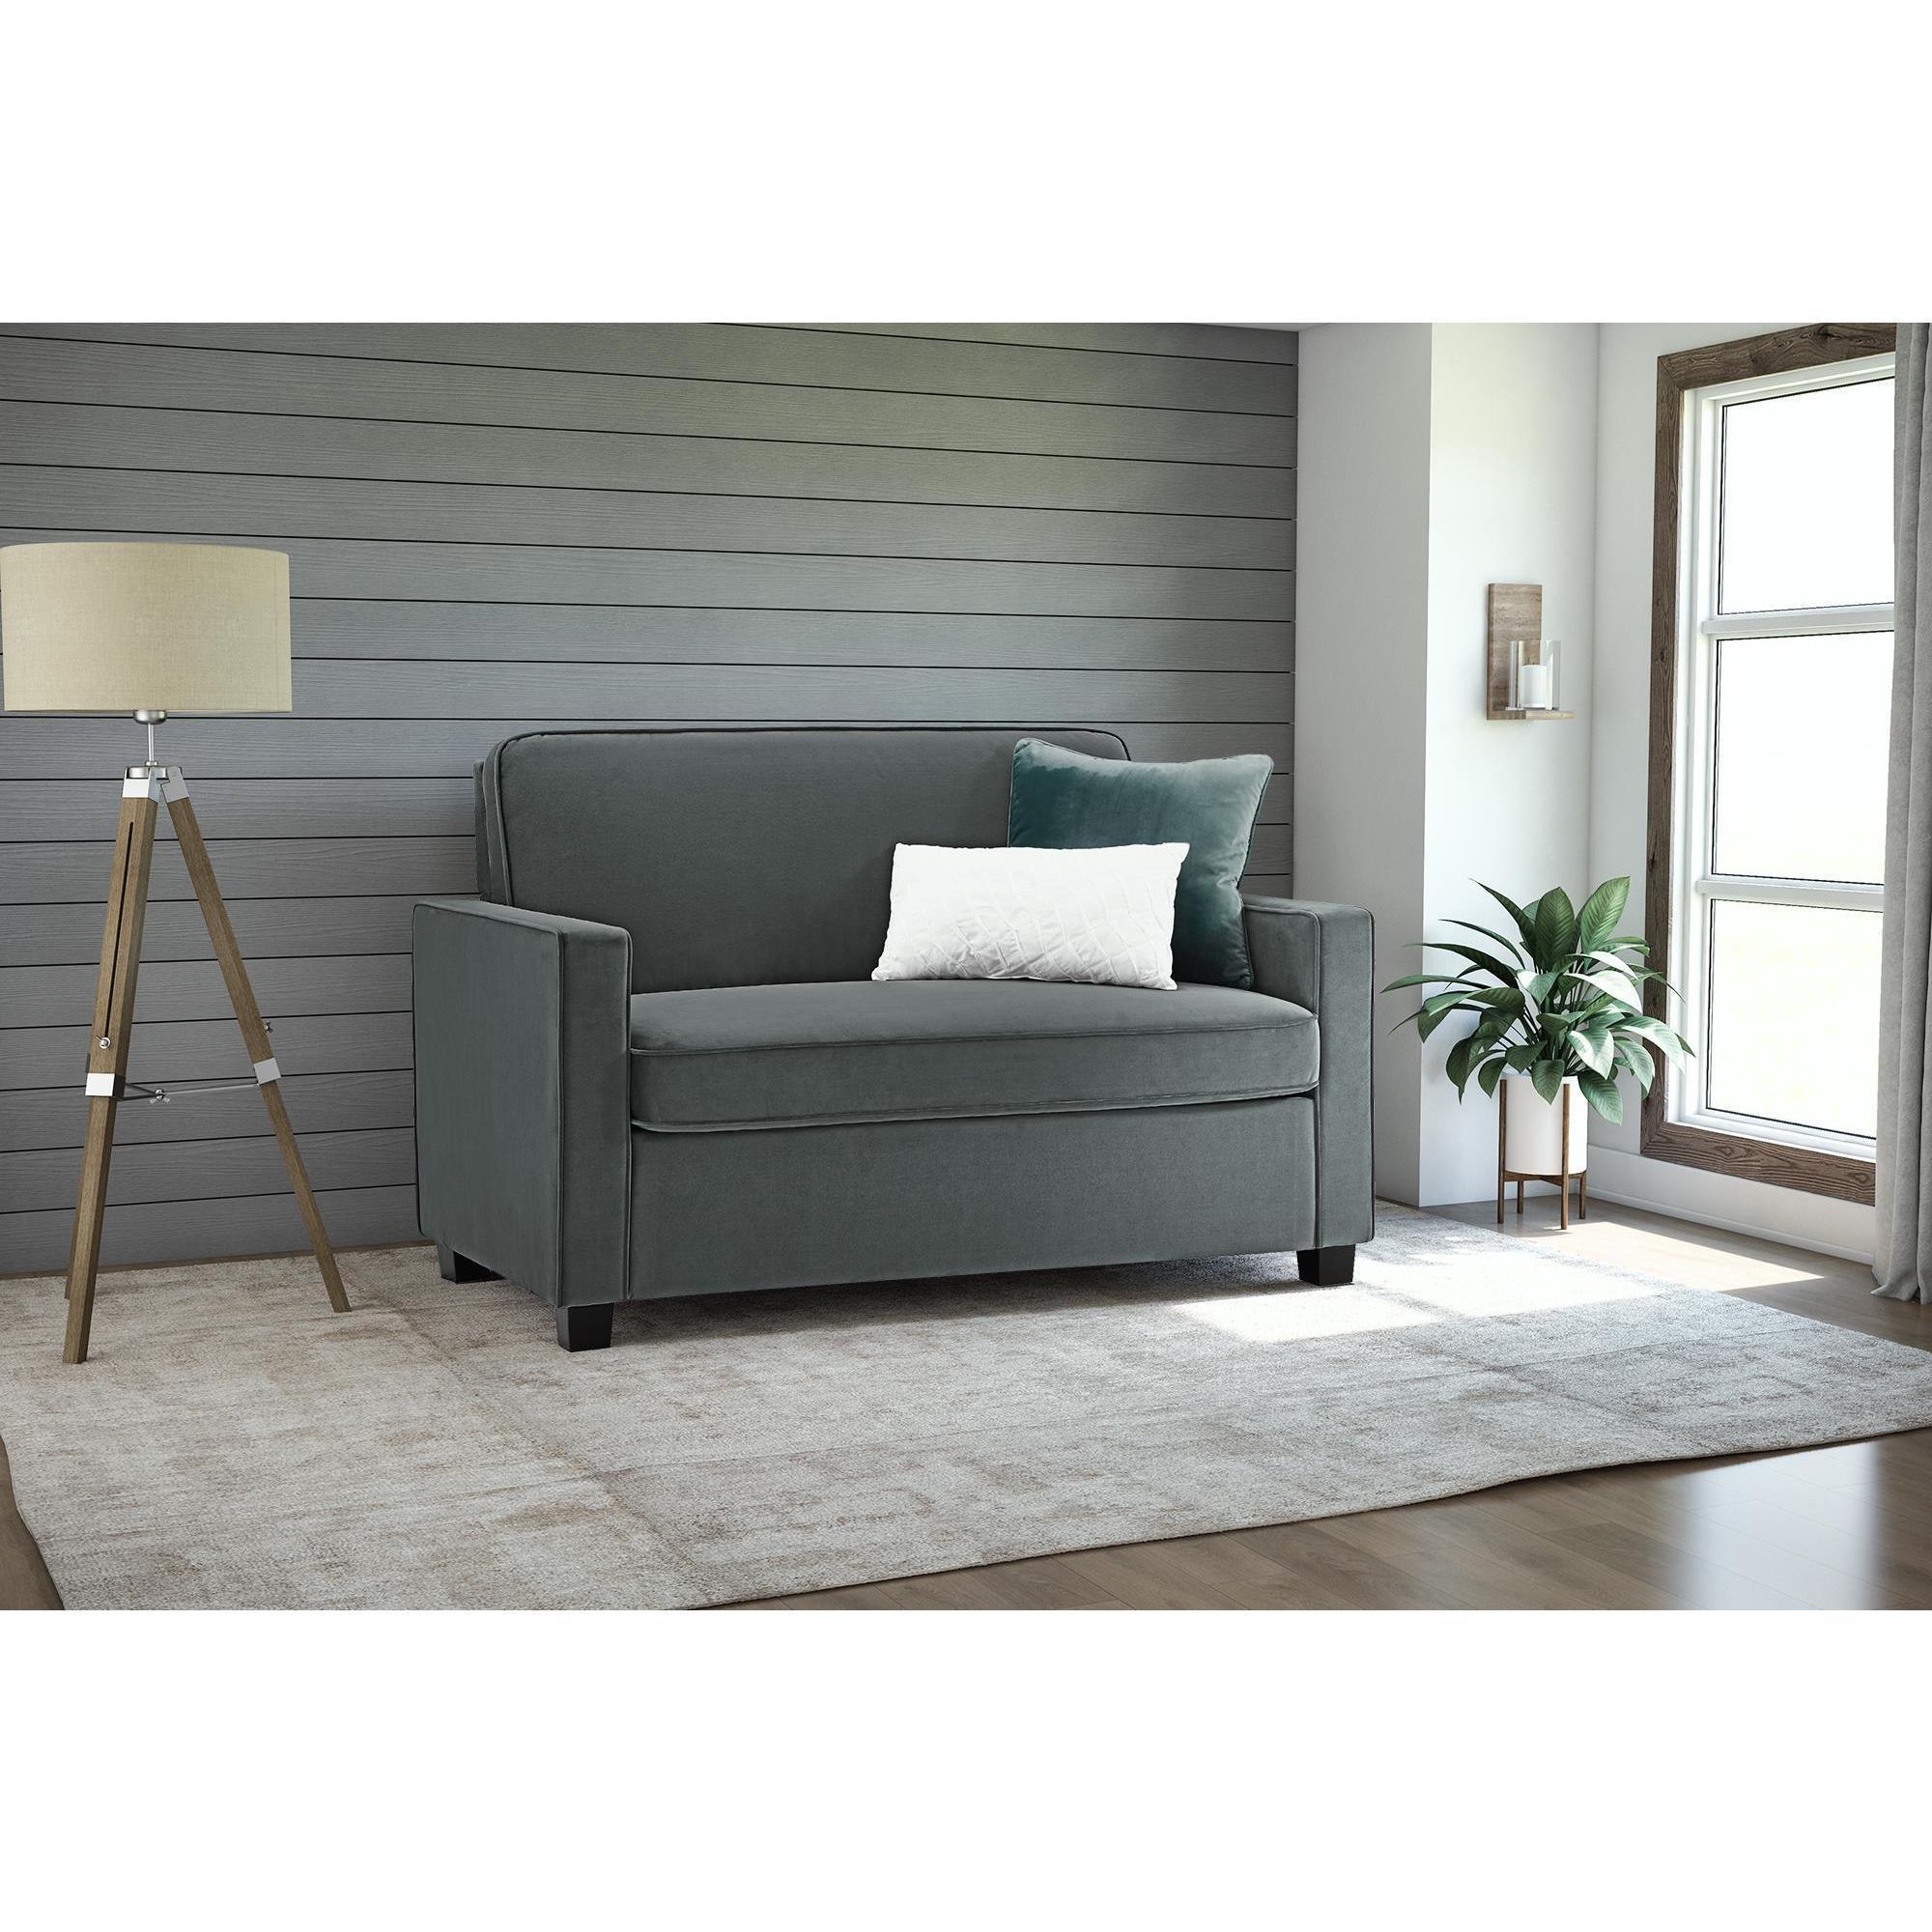 - Shop Copper Grove Kurdica Grey Velvet Twin Sleeper Sofa